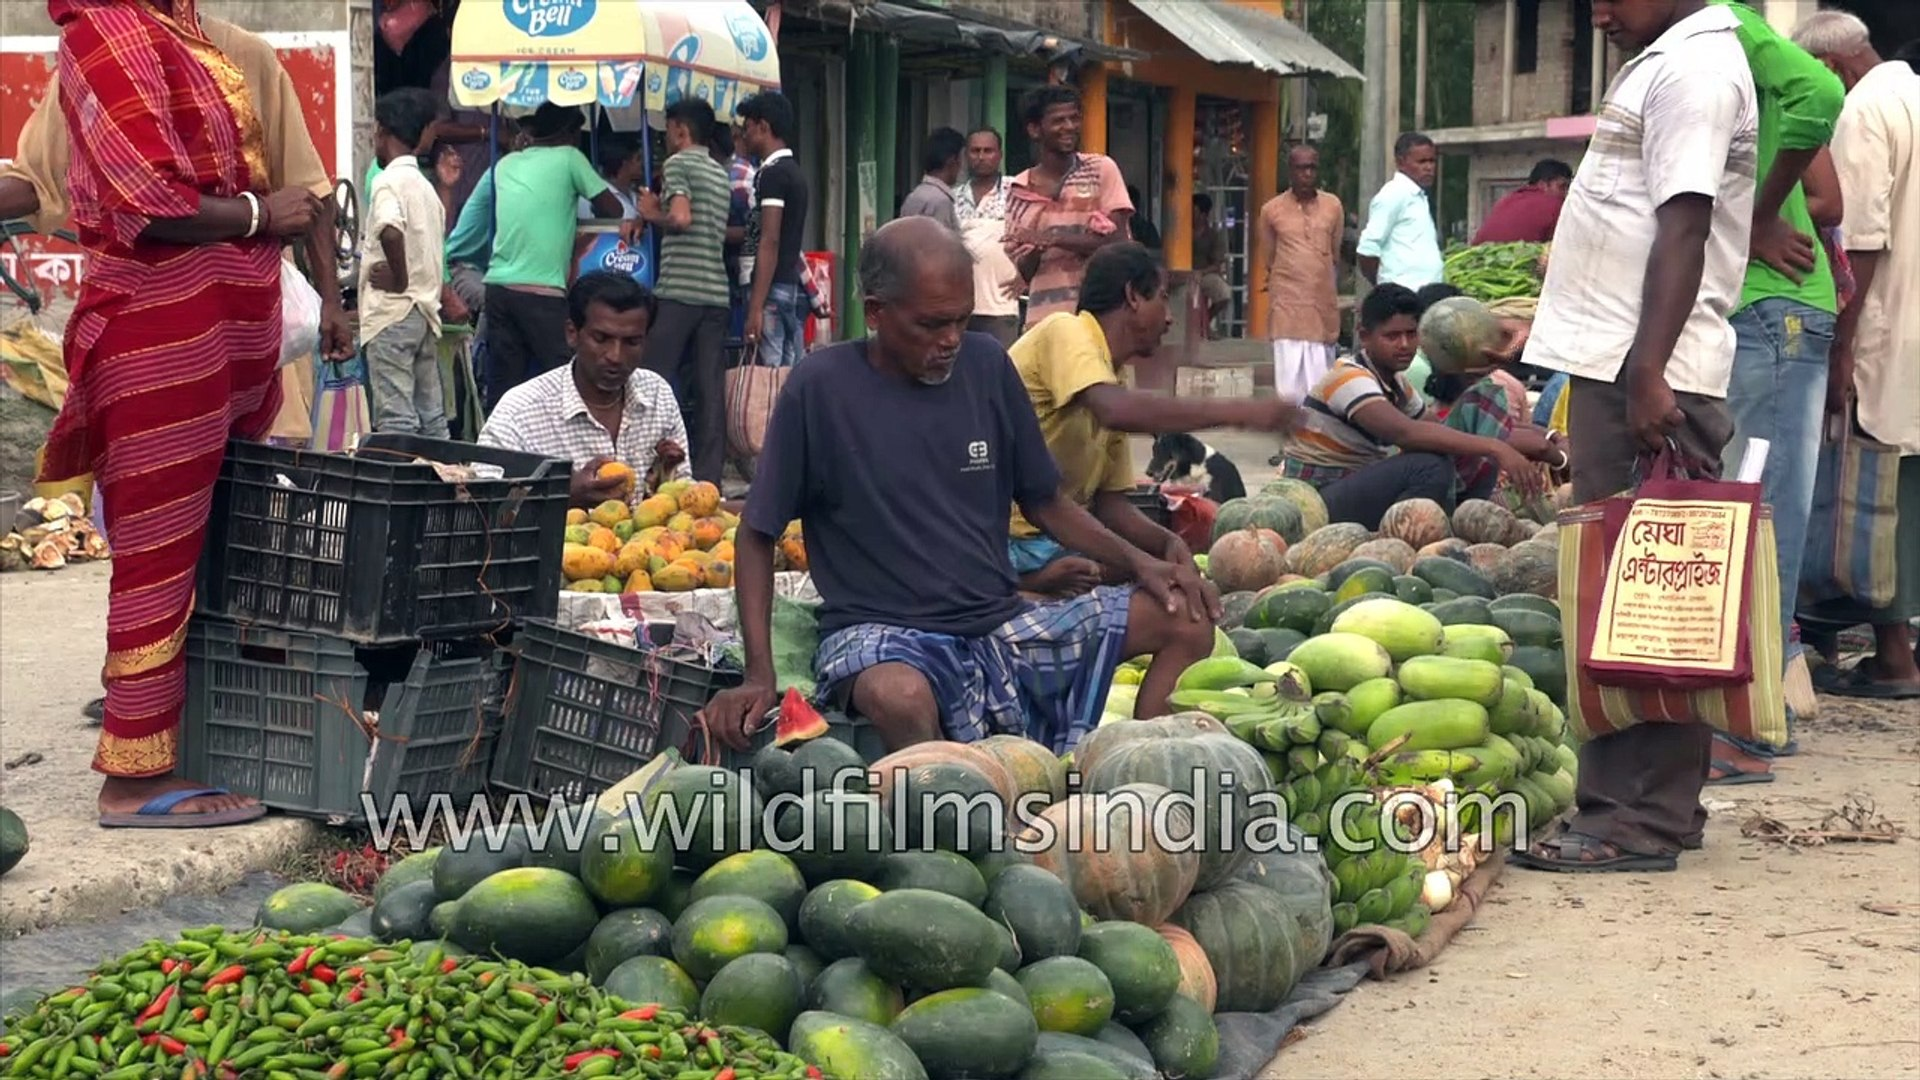 Durgapur Vegetable market at Satjelia Village,  Sundarbans, West Bengal, India. 4K stock footage.